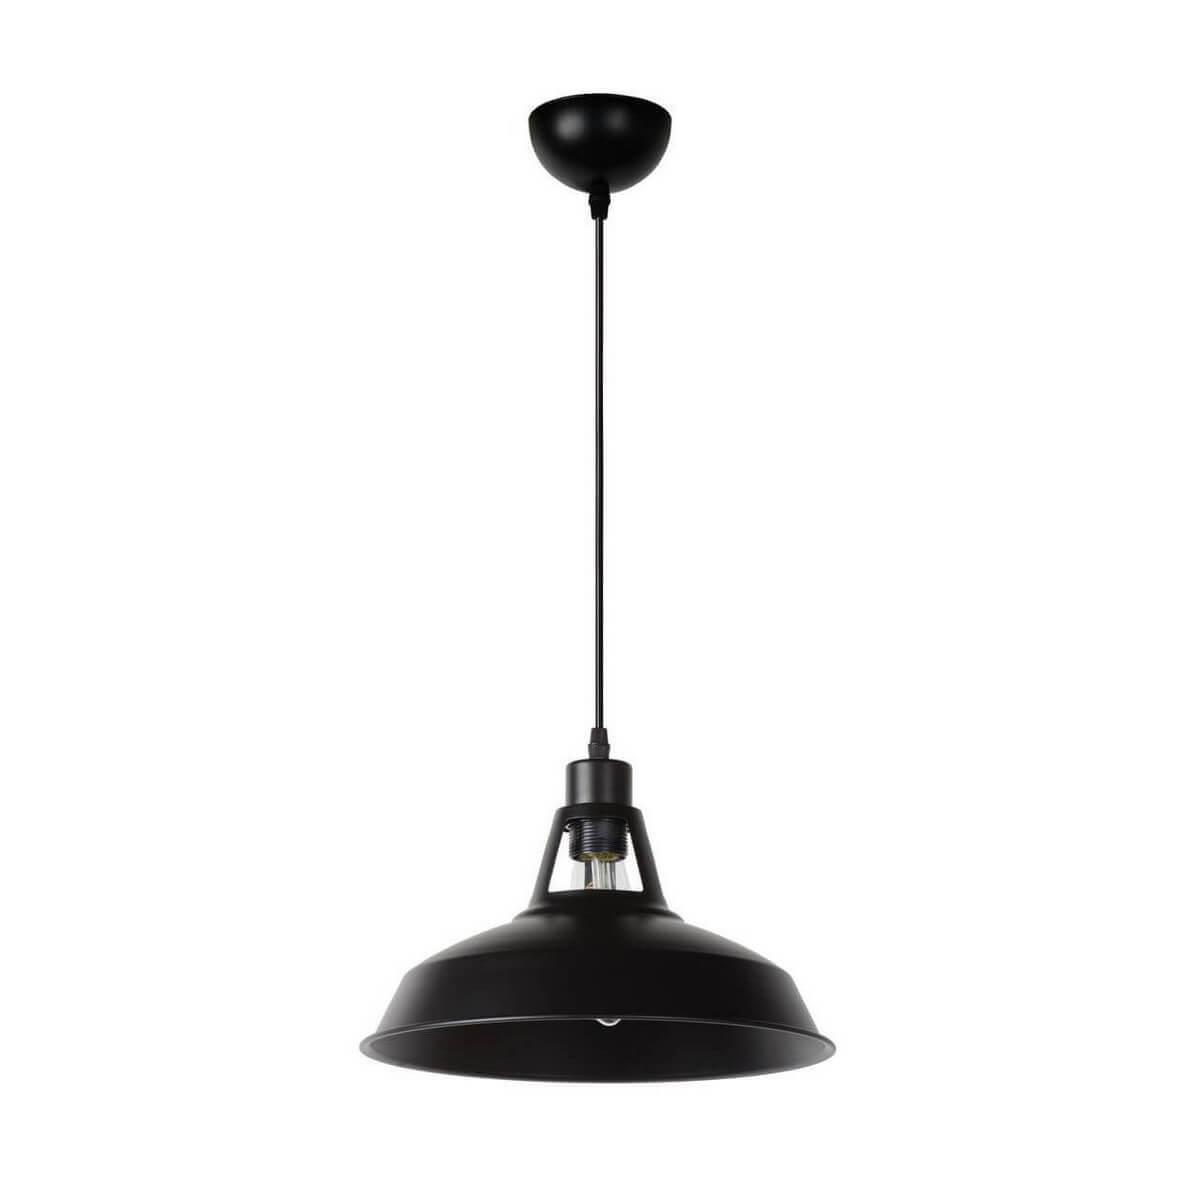 Светильник Lucide 43401/31/30 Brassy-Bis цена 2017